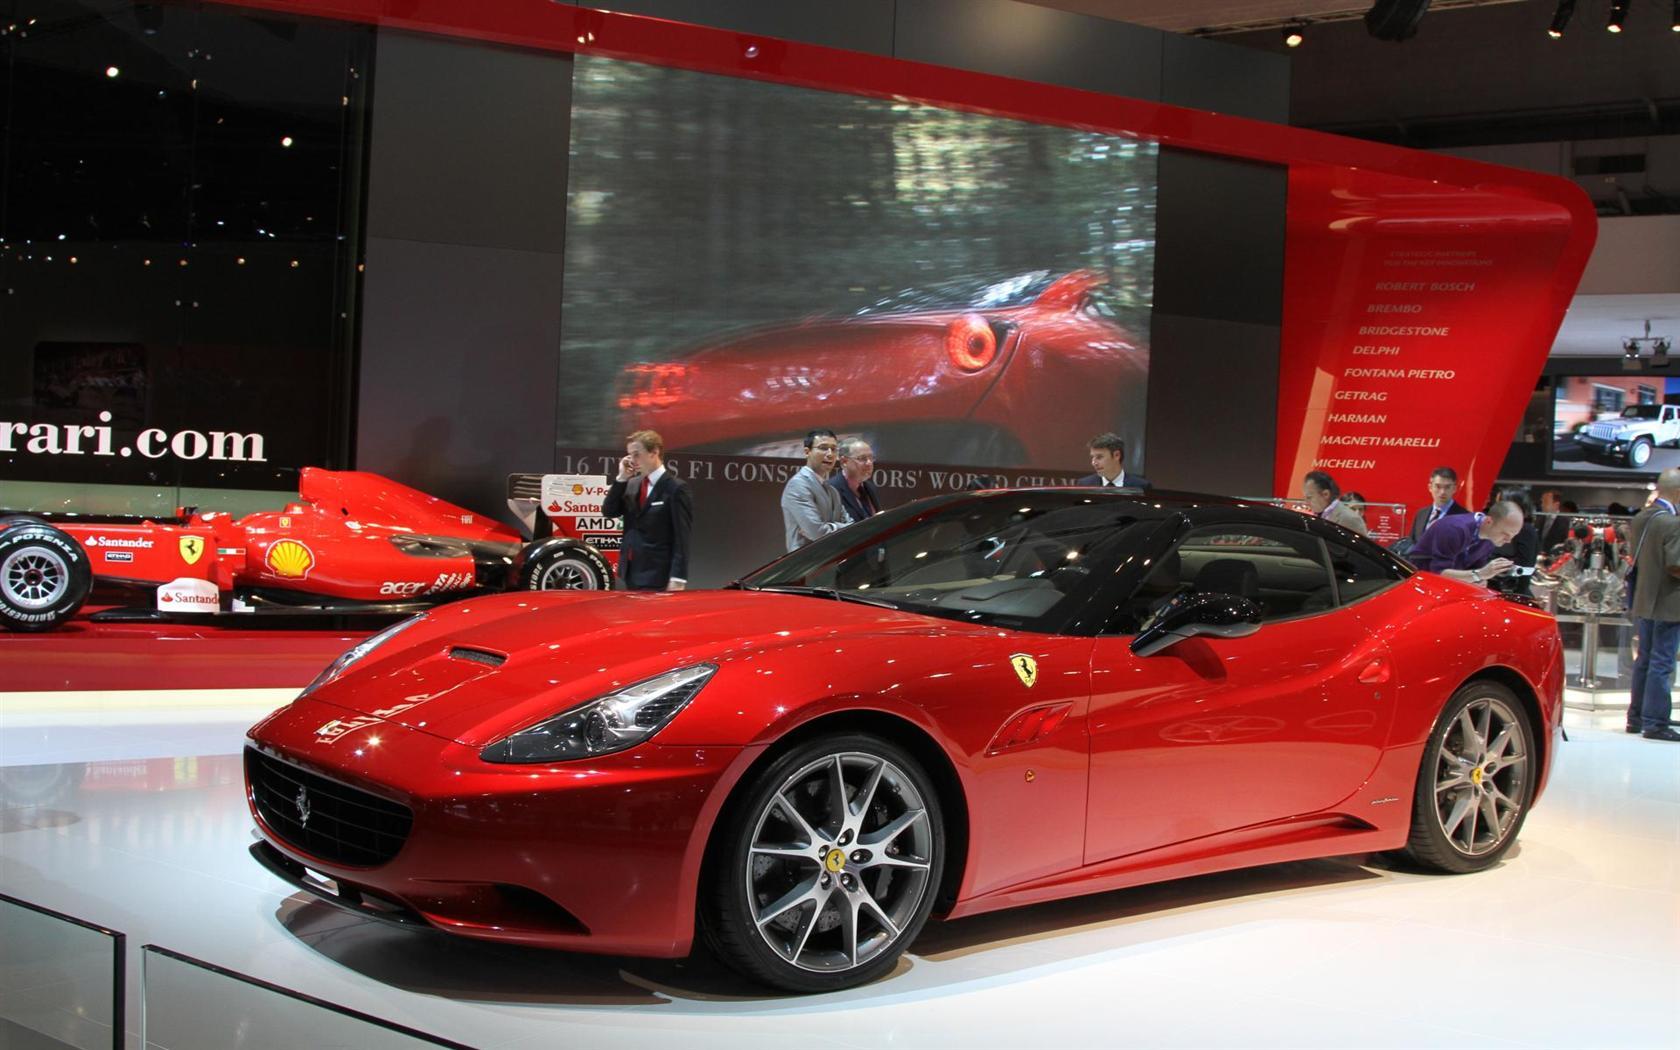 Supercar Ferrari California